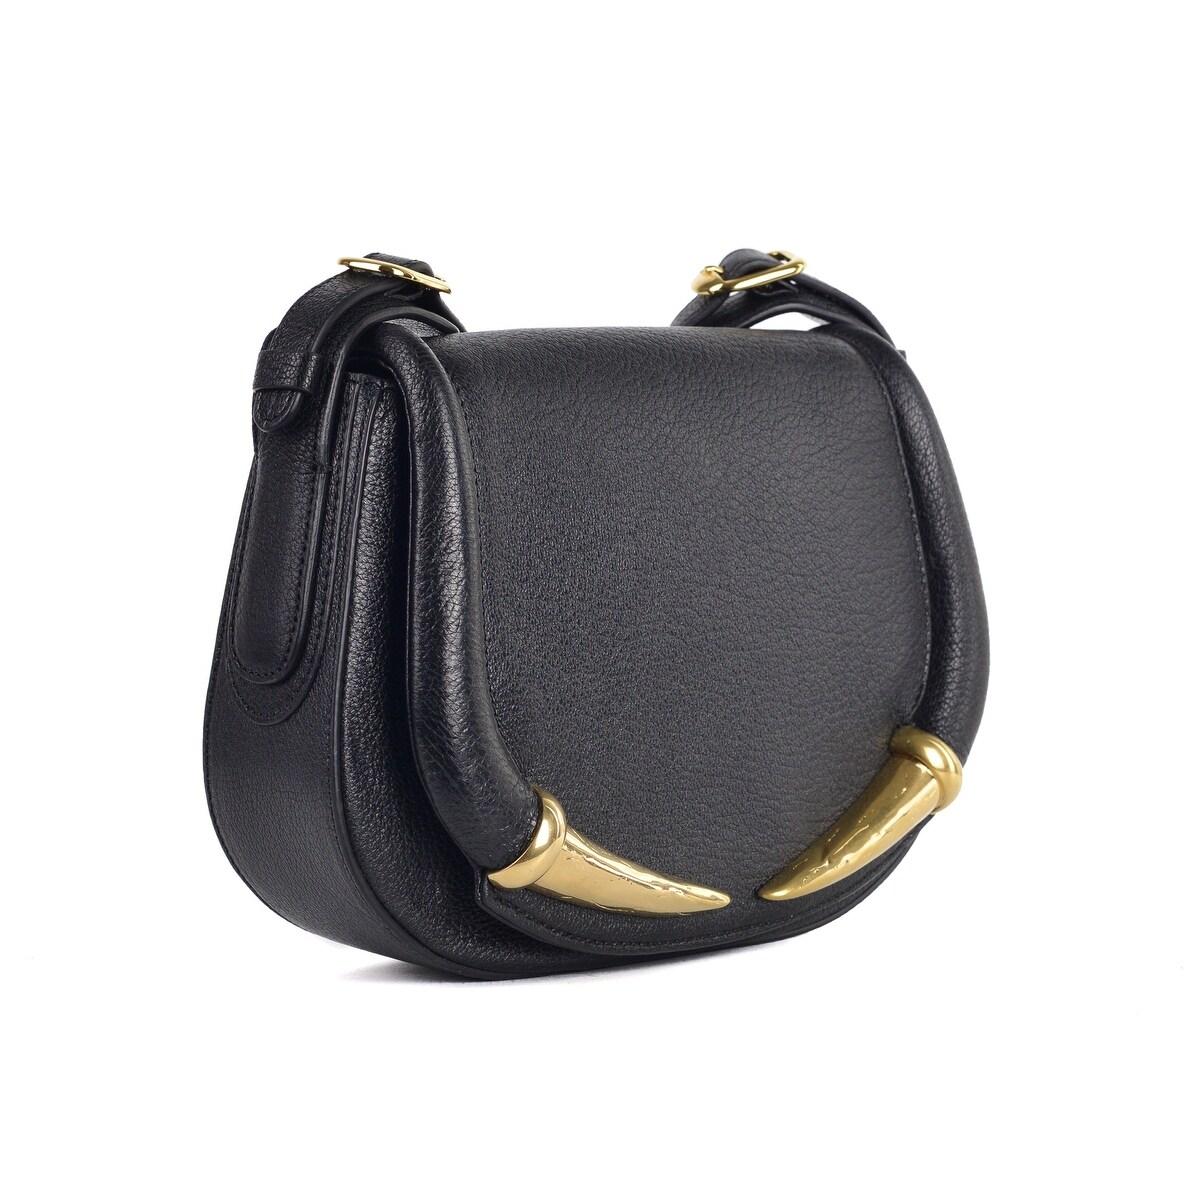 Roberto Cavalli Womens Black Grained Leather Tusk Shoulder Bag~RTL$1695